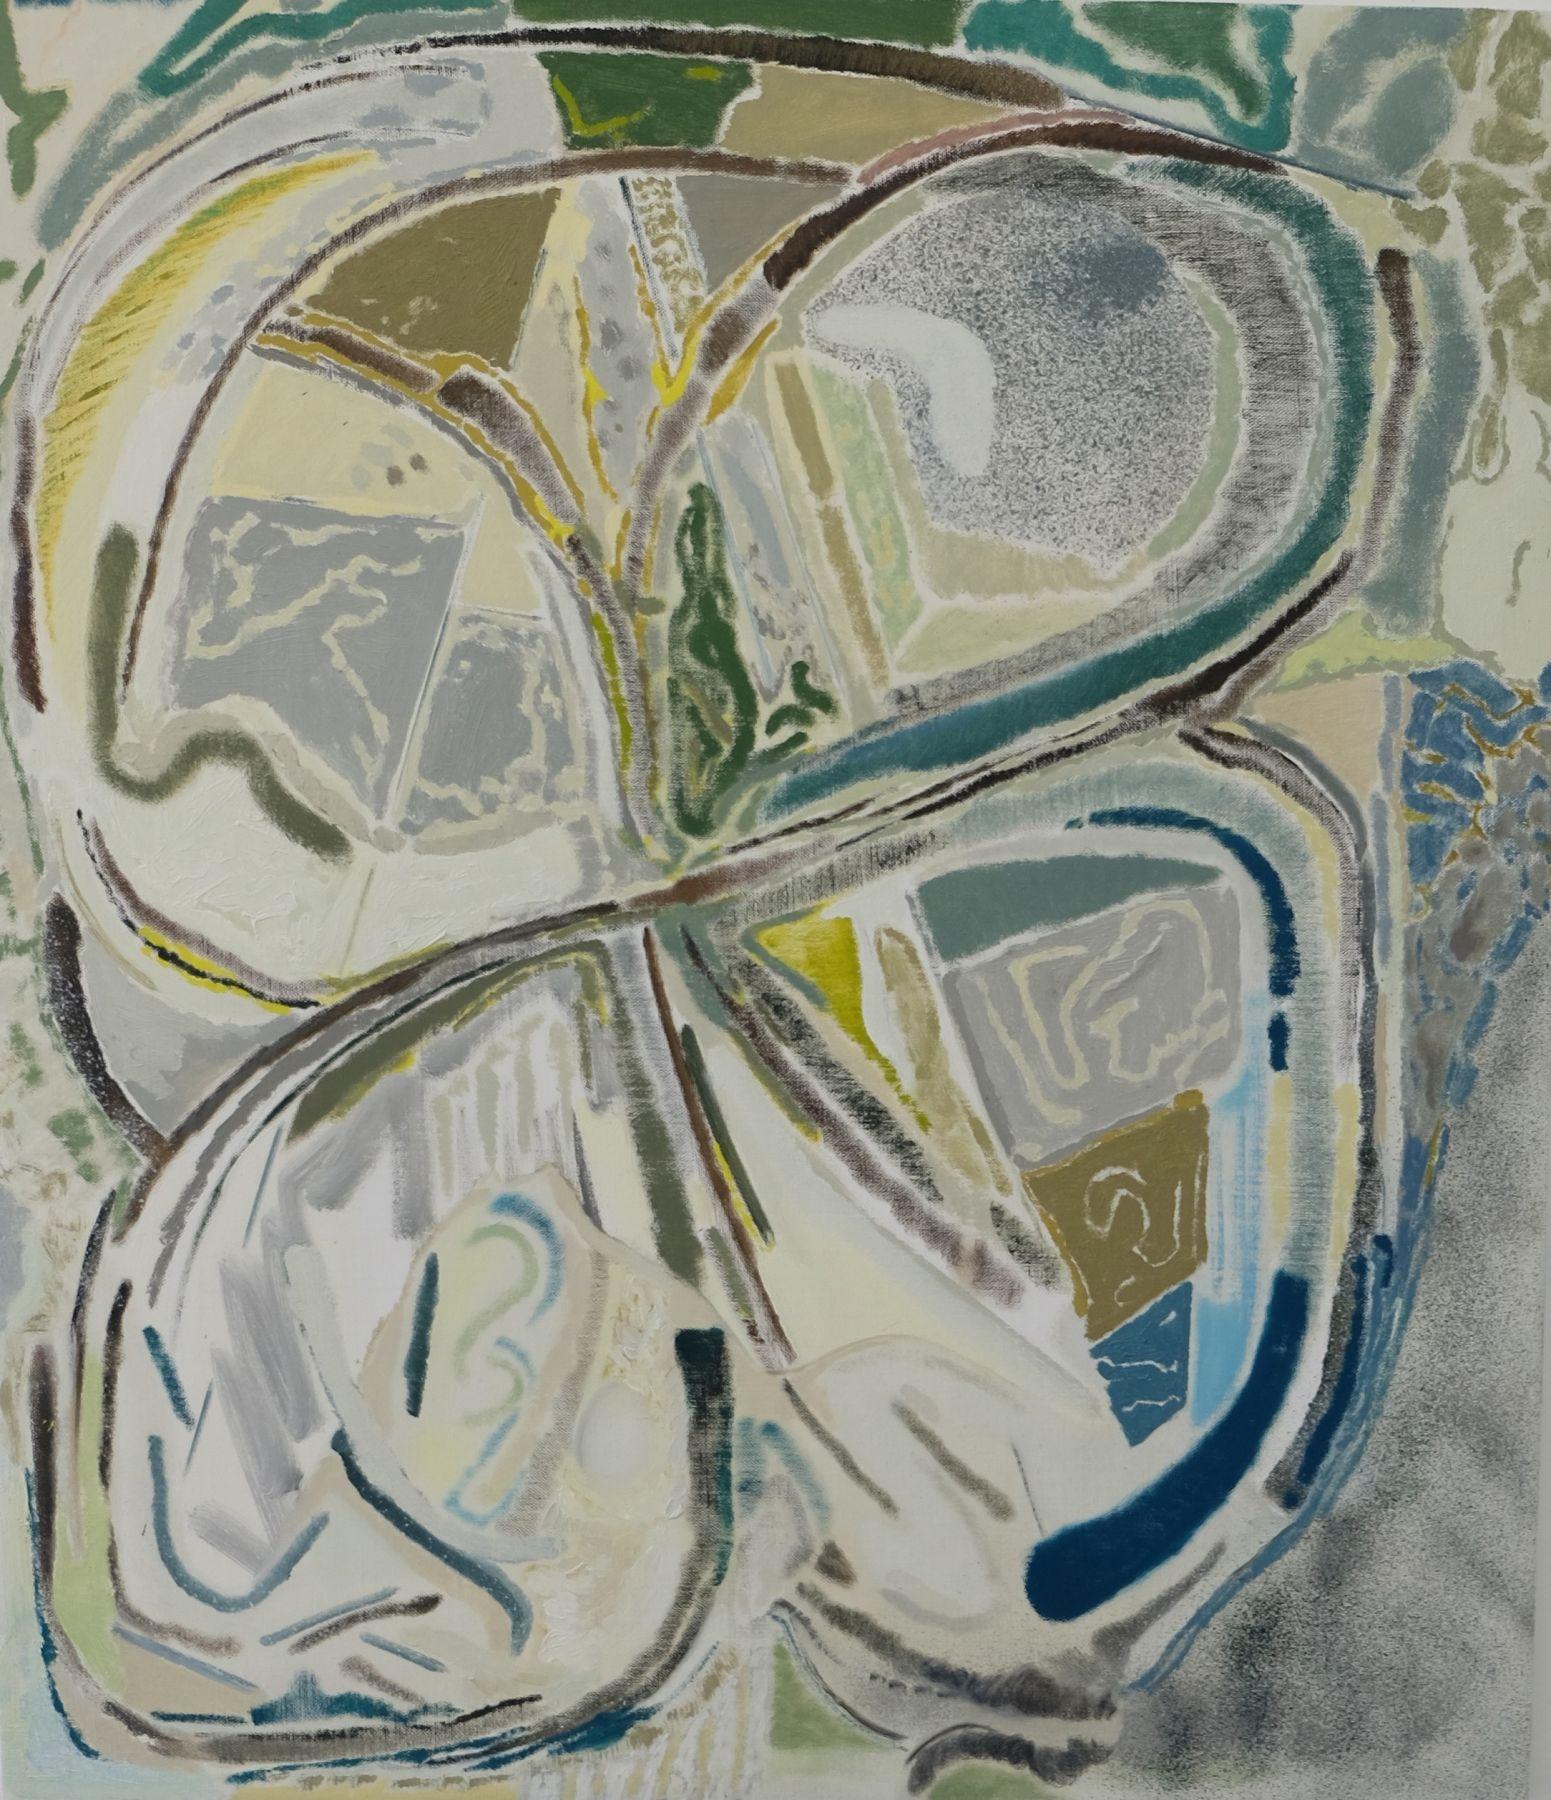 "Daniel Noonan, Symbol, Oil on linen, 30 x 26"""